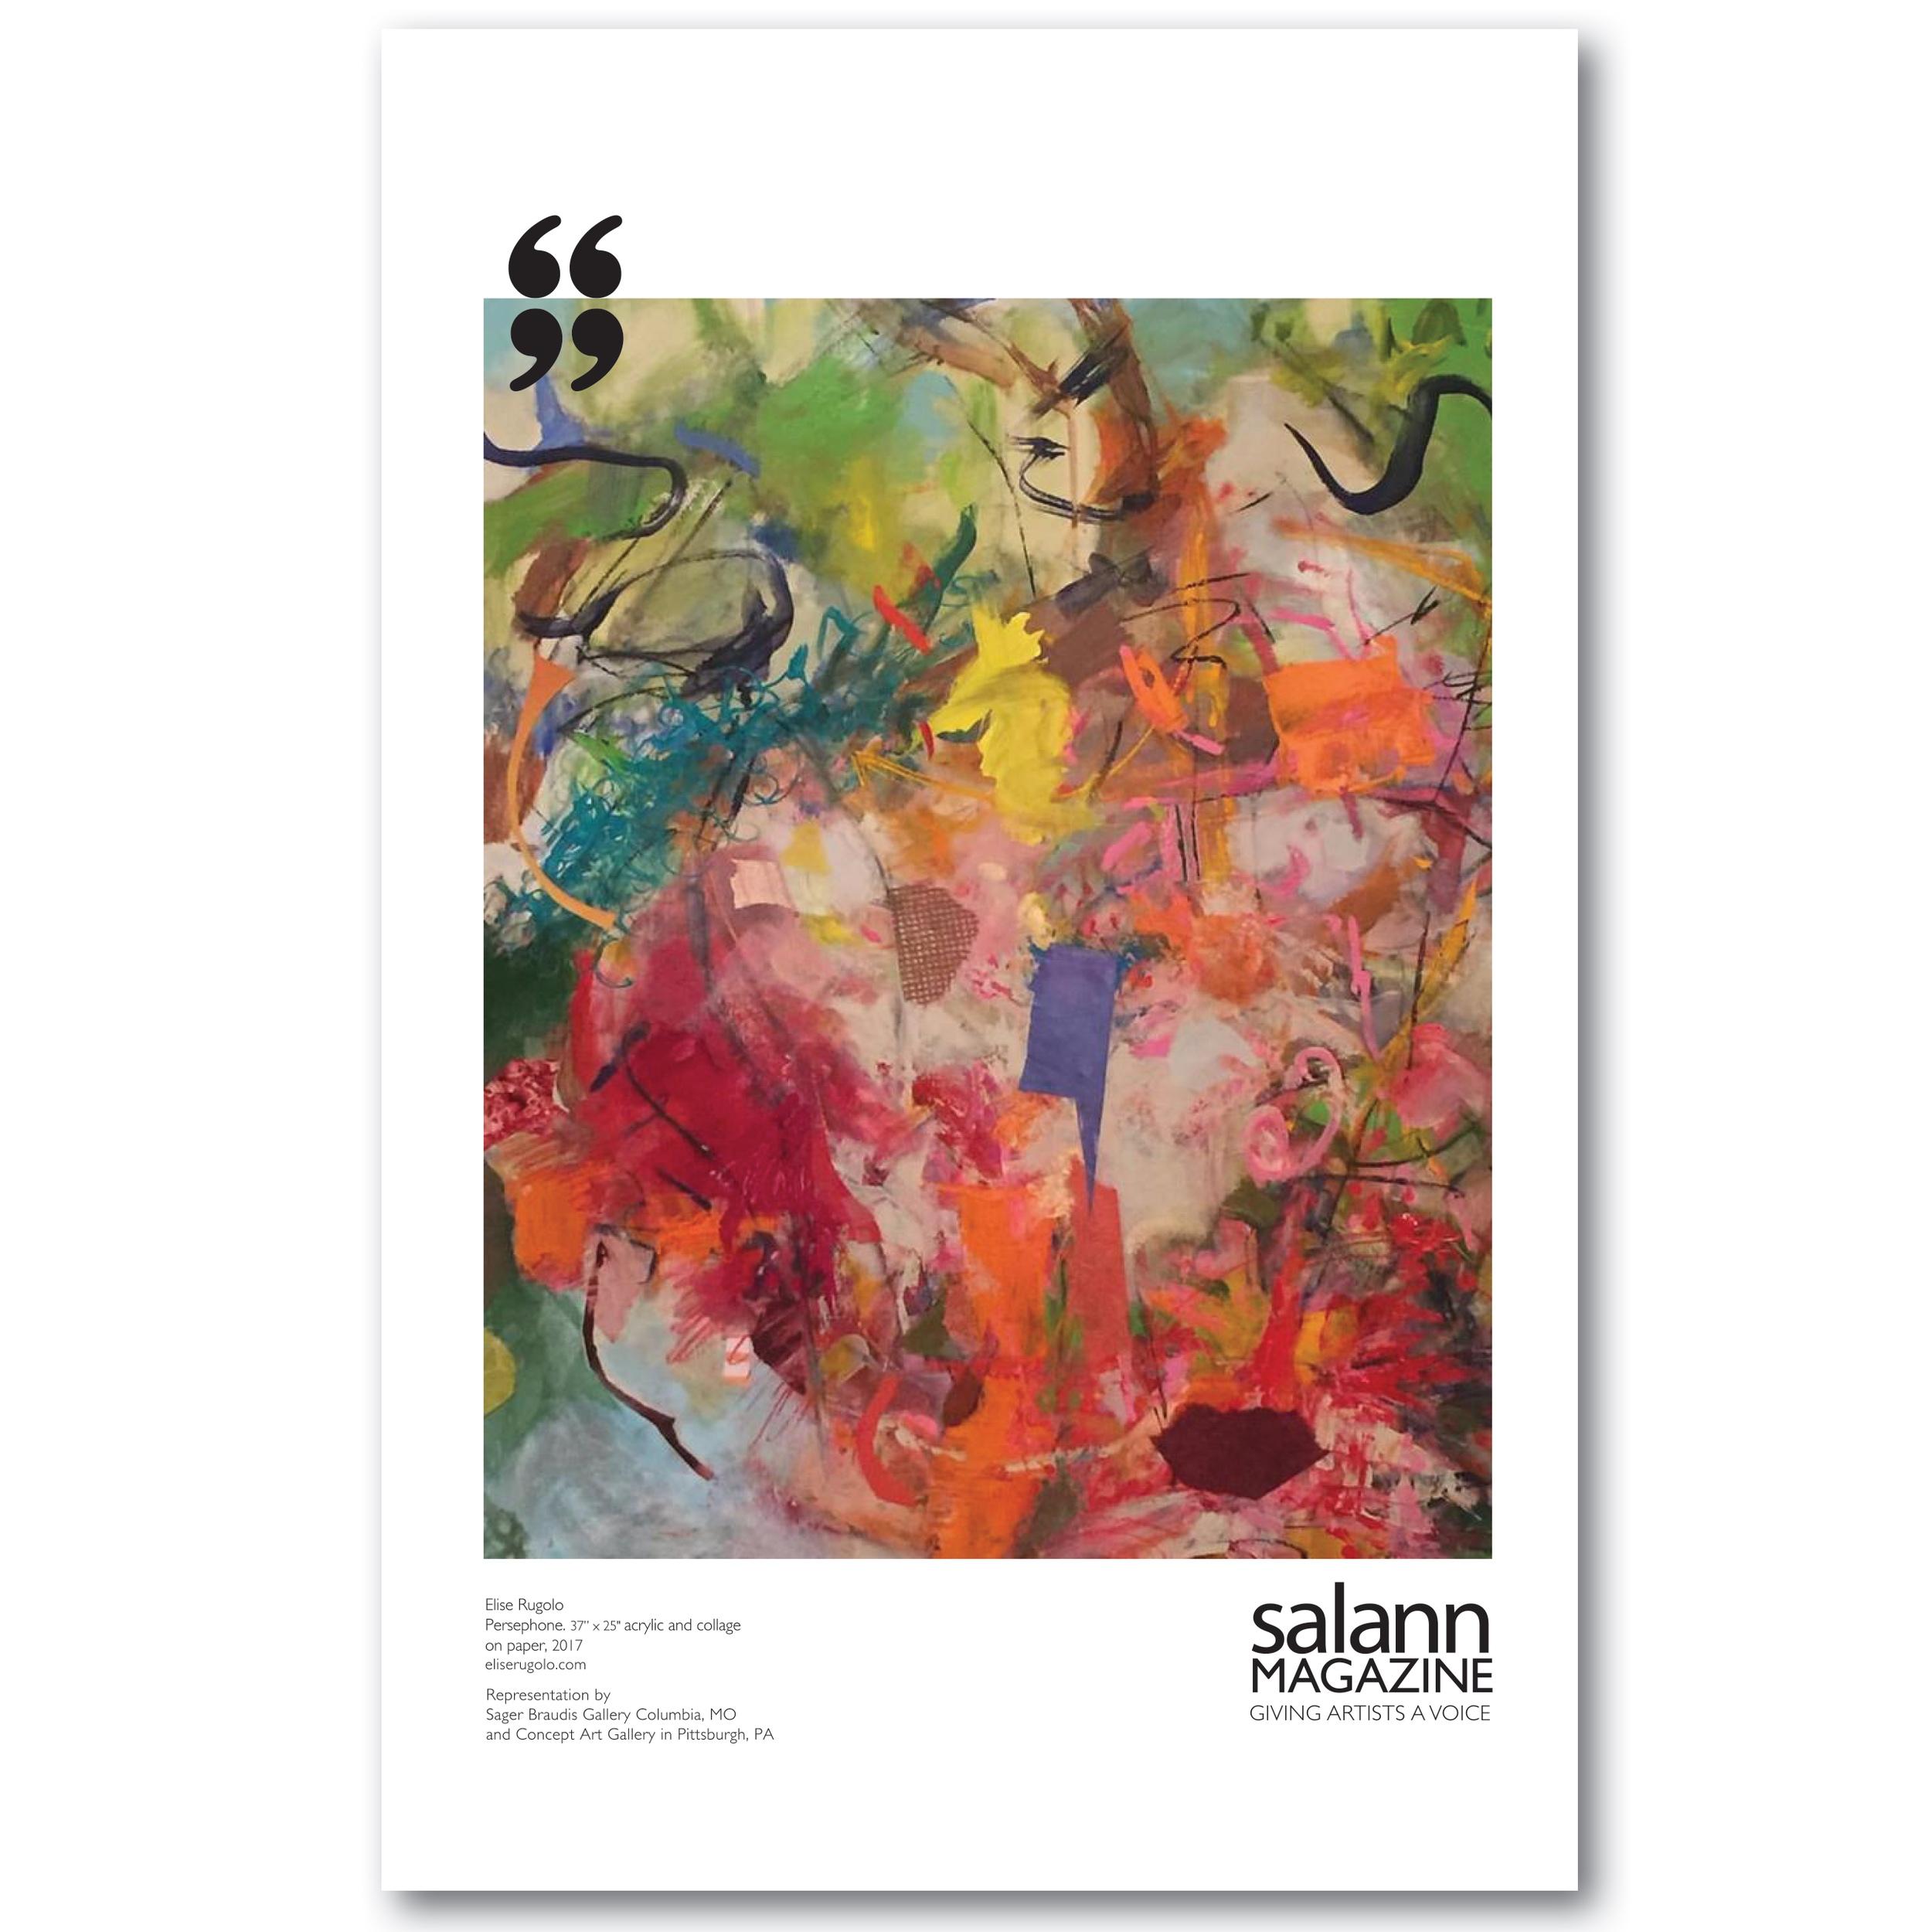 SalannMagazineCoverJulian2ndEditionWEB+copy.jpg